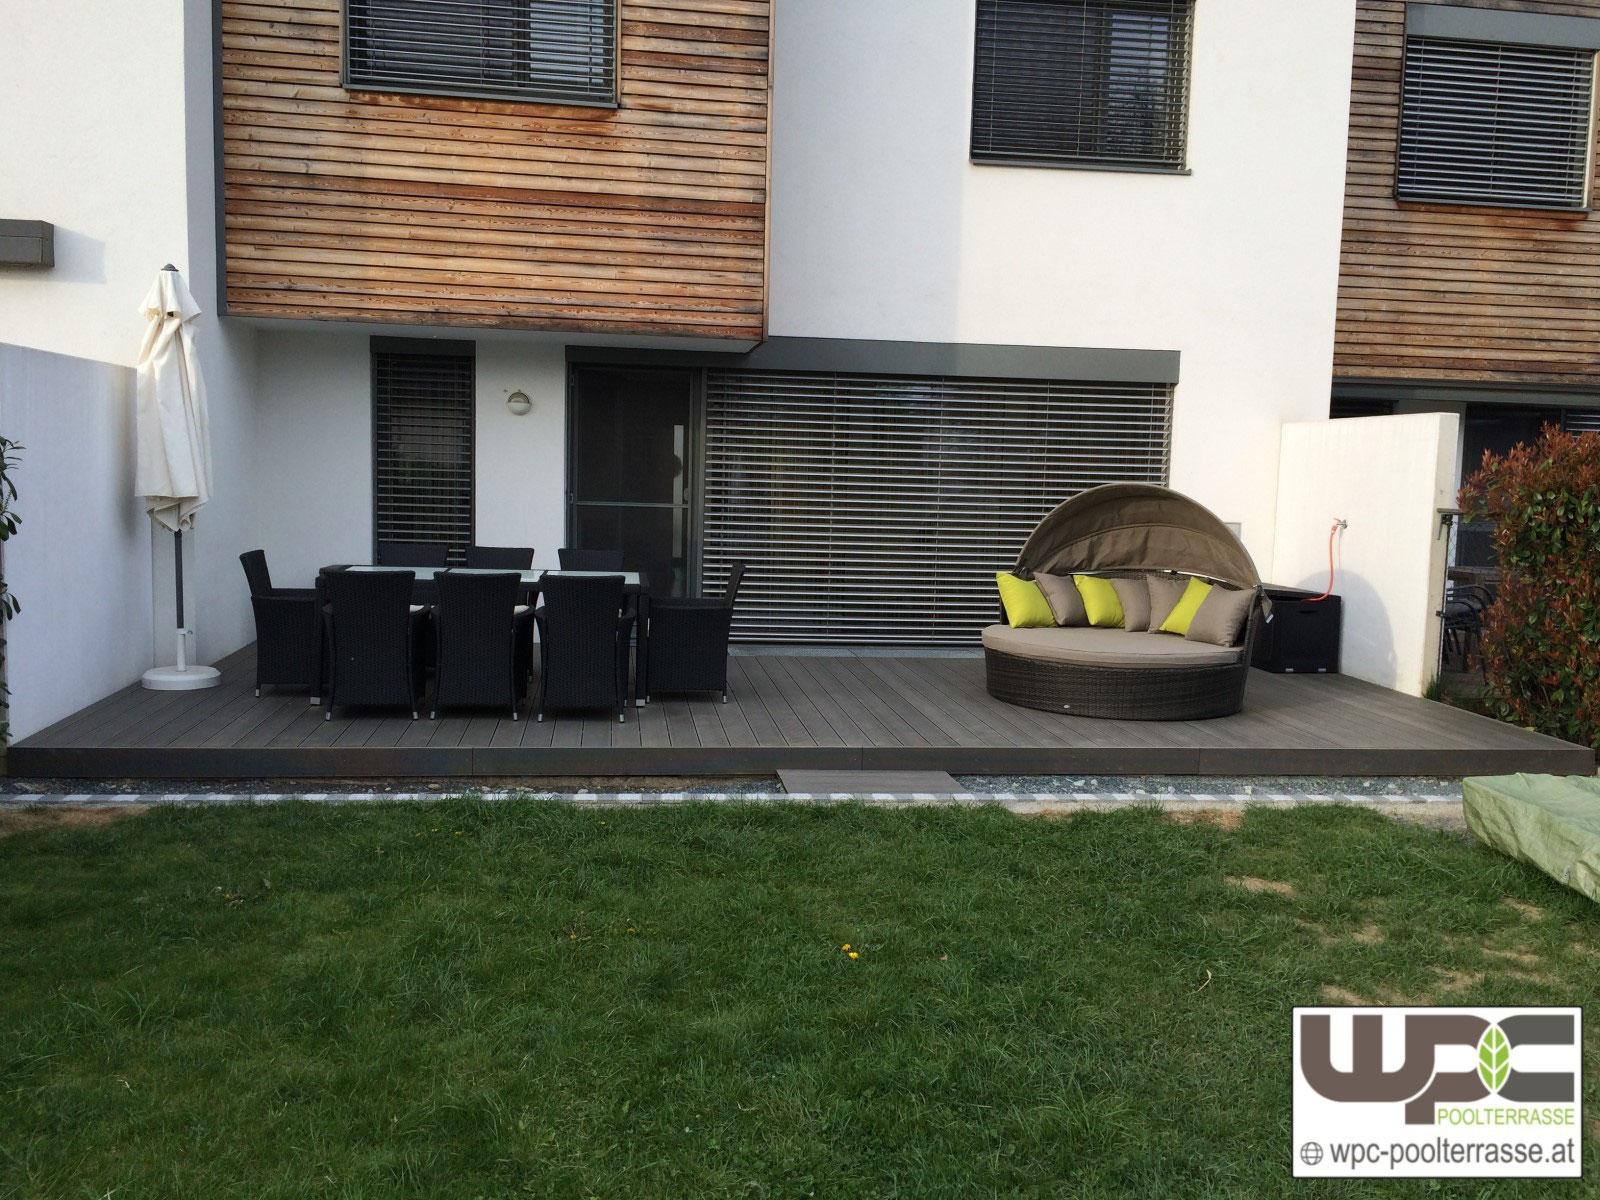 Bpc Verlegung Video Bilder Fur Terrassendielen Wpc Terrasse Balkon